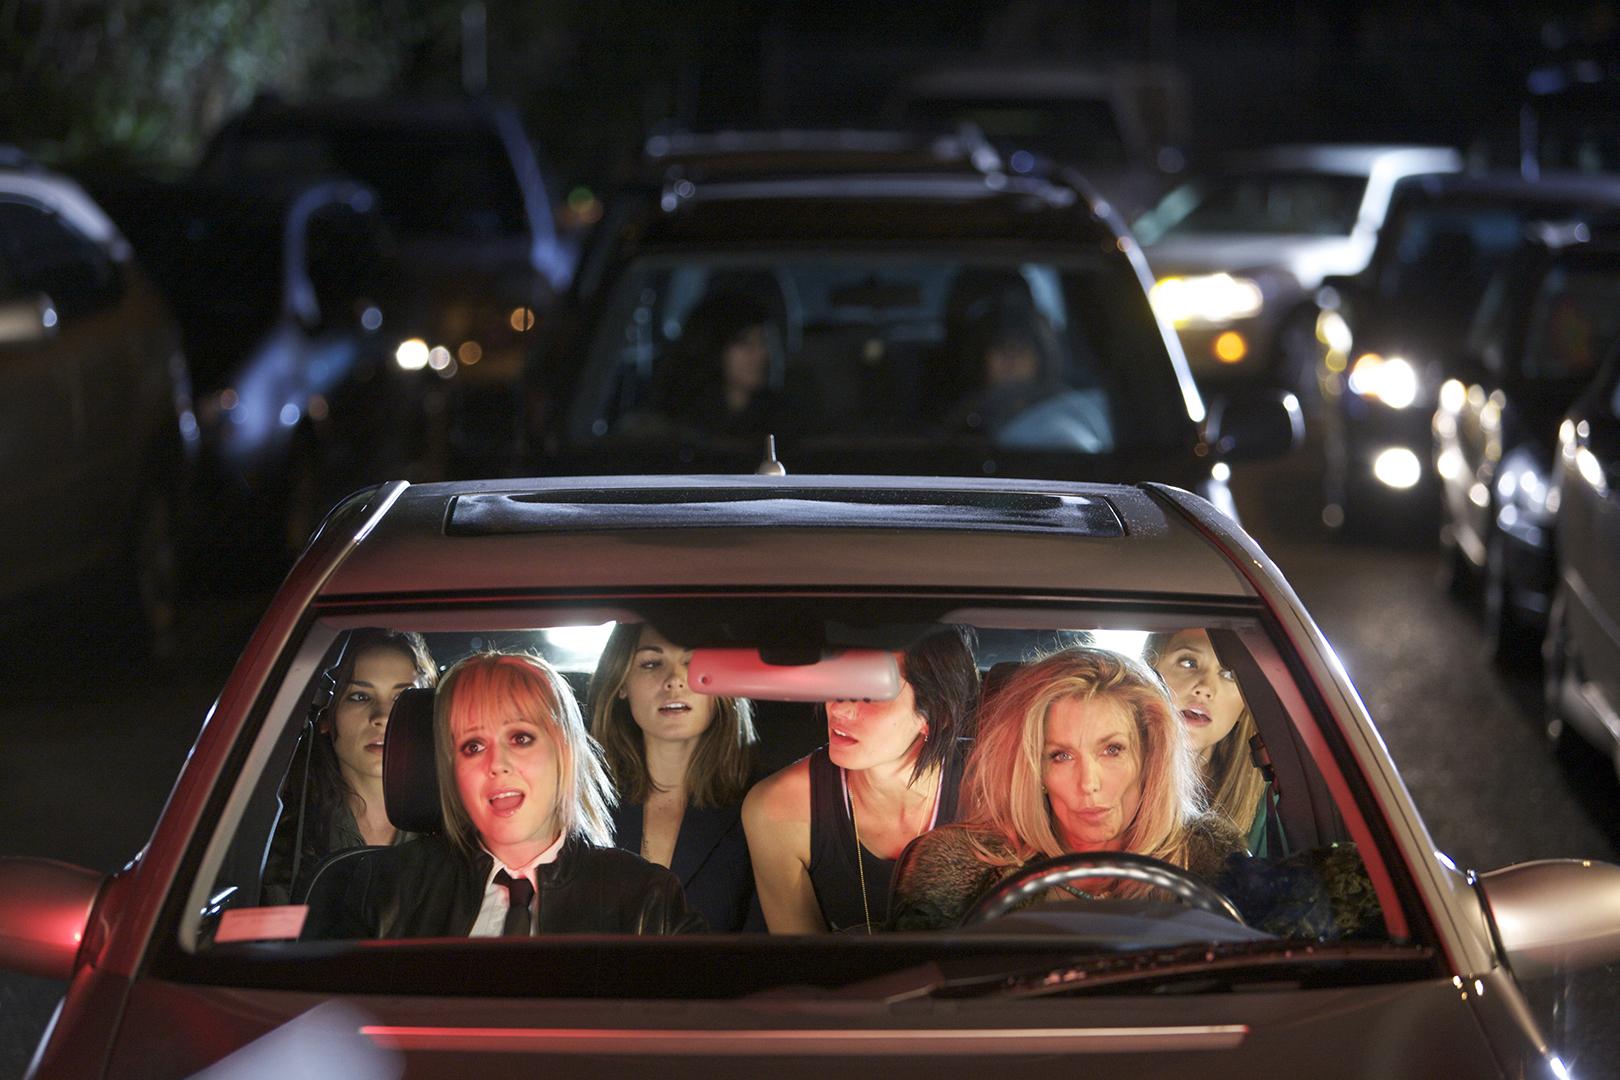 Girltrash : All Night Long